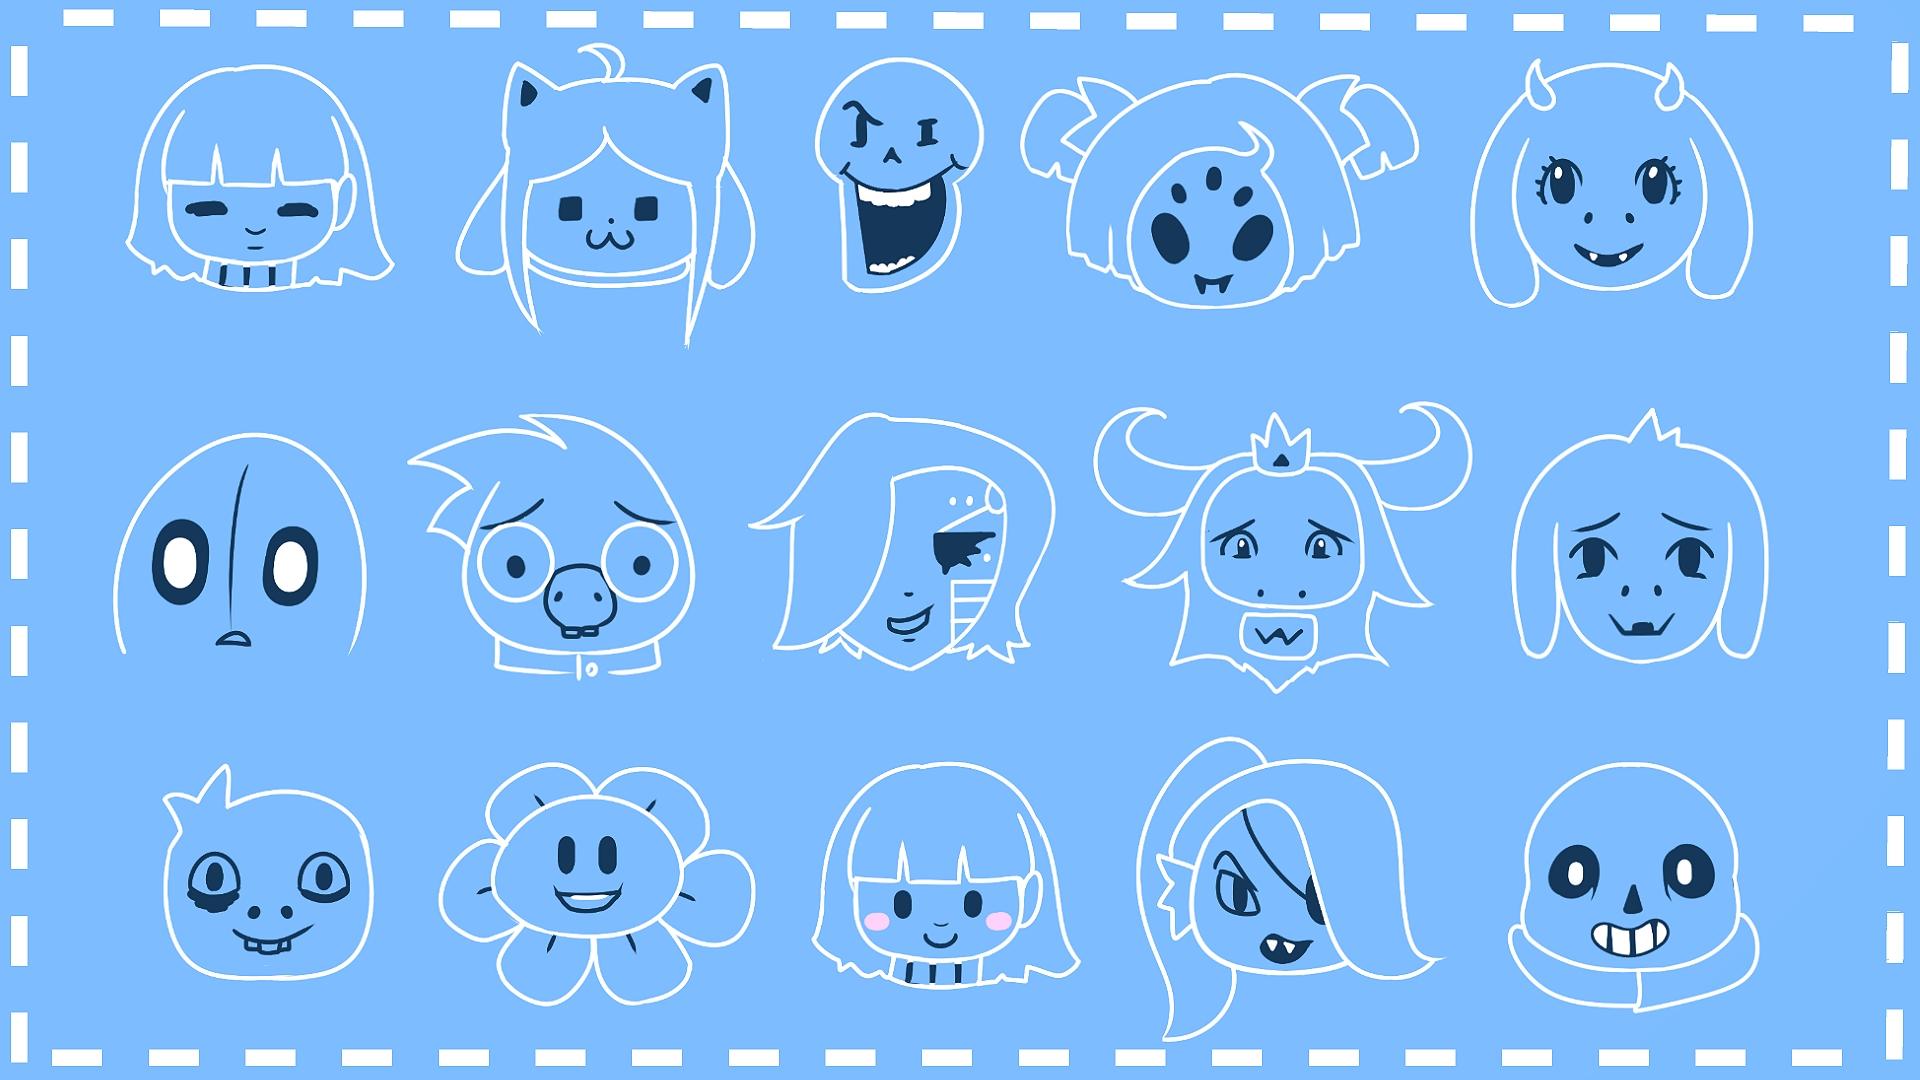 Amazing Undertale Wallpaper Animal Crossing 84588 Hd